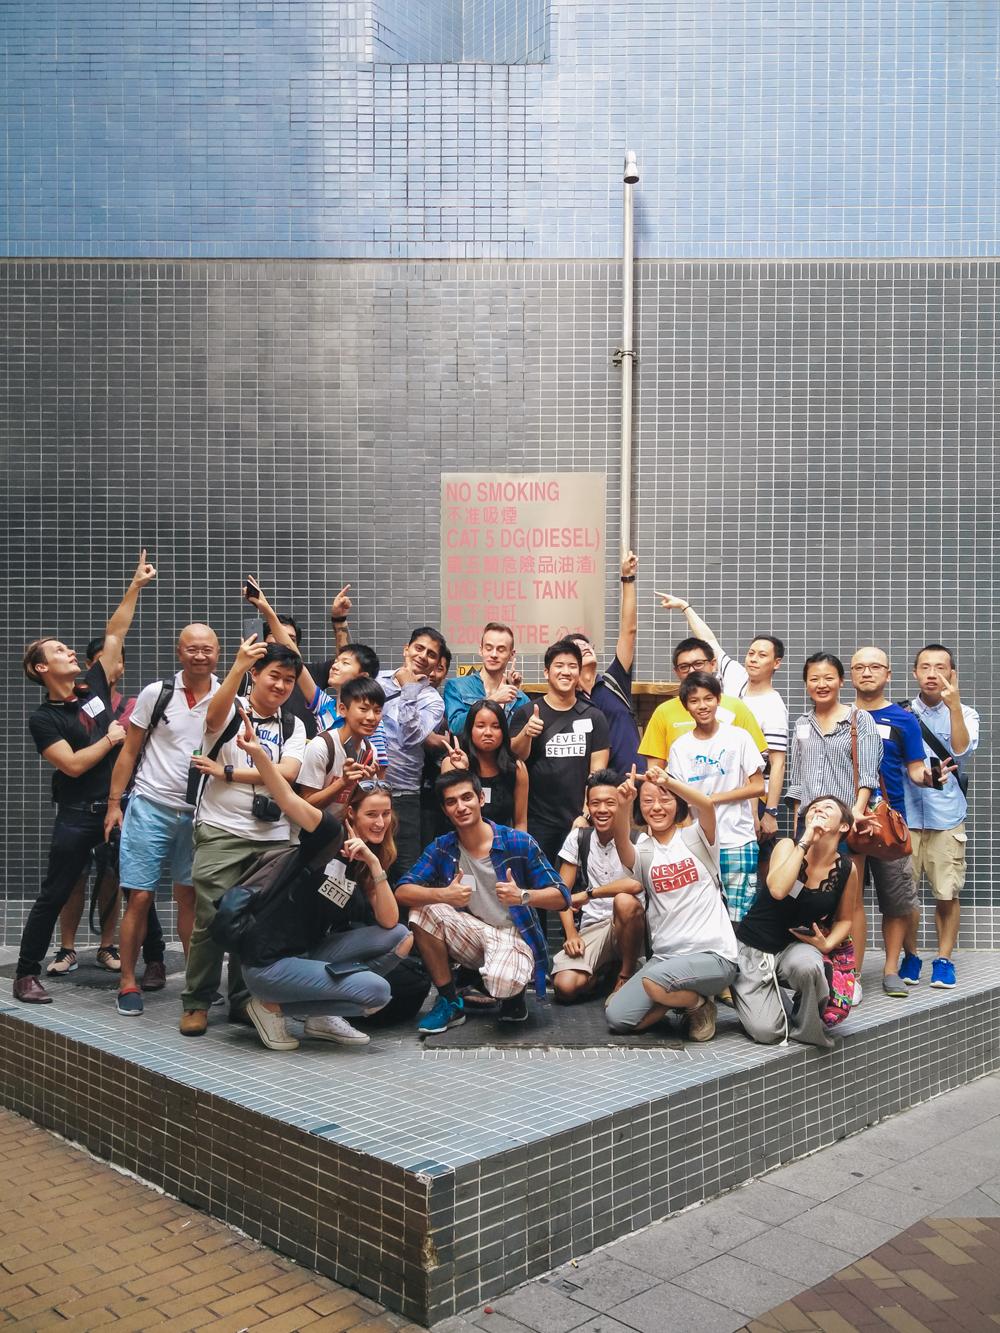 OnePlus 2 Hong Kong Photowalk